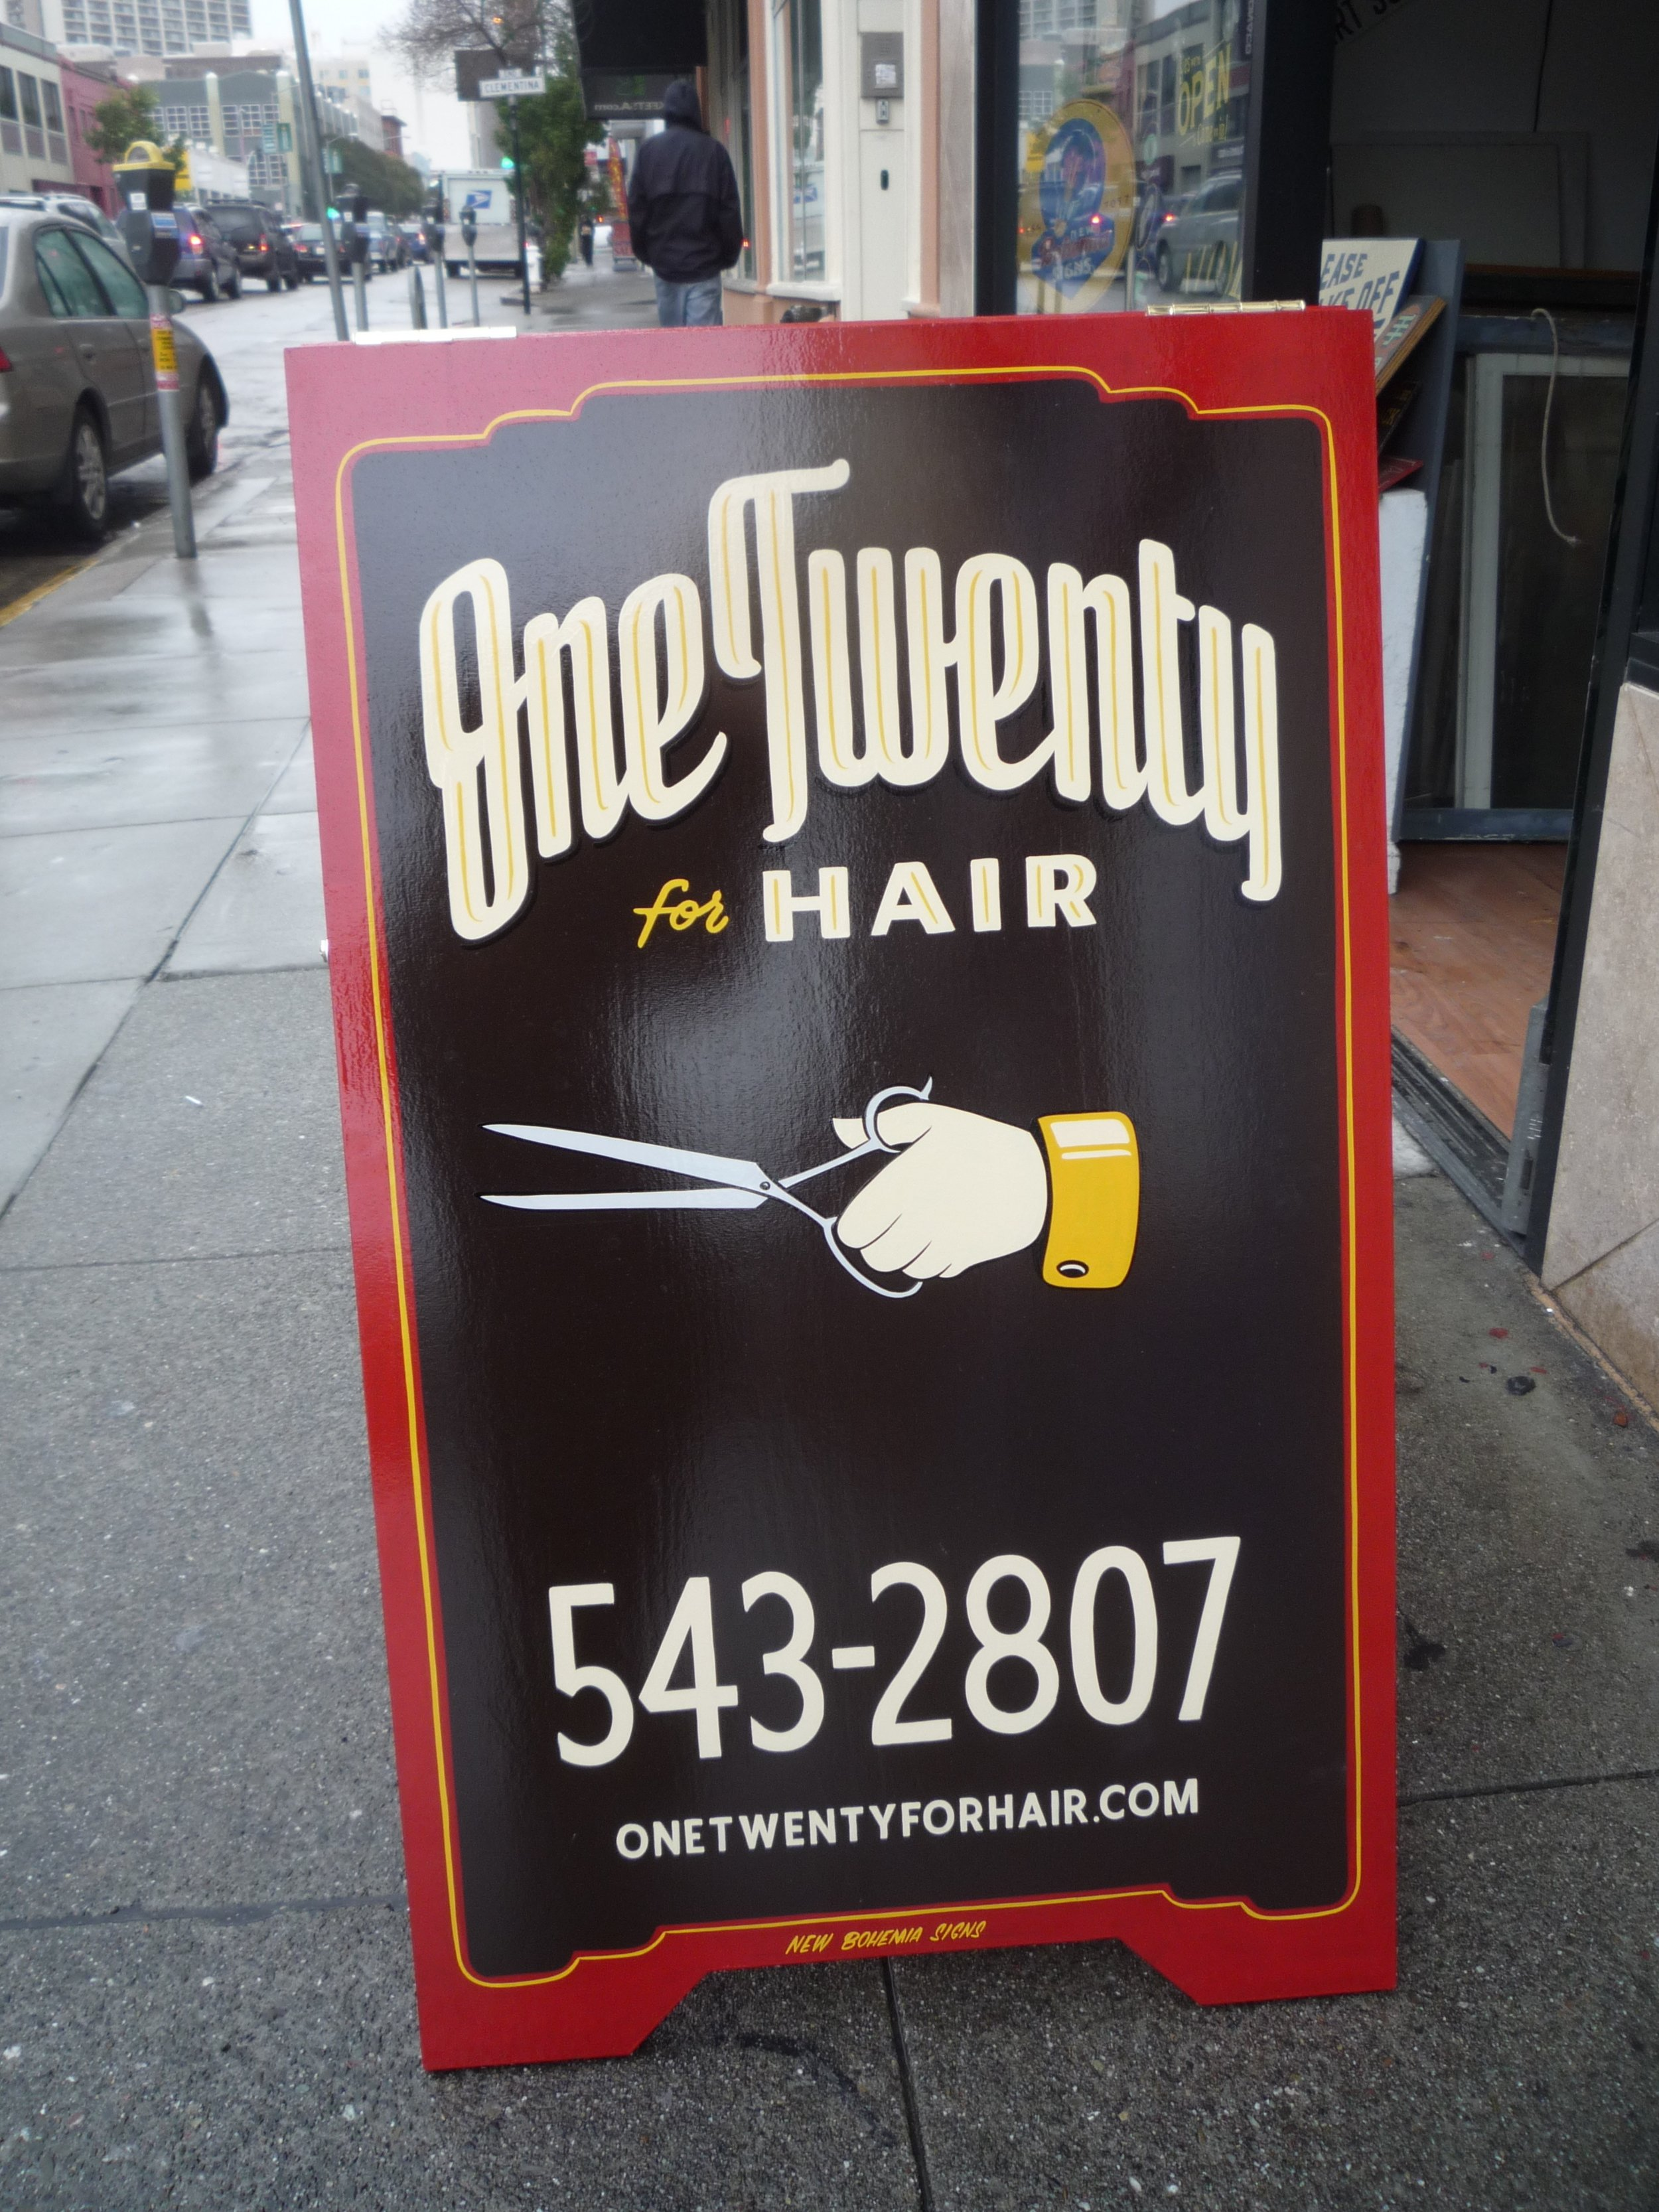 A-FRAME-one-twenty-for-hair_9352889807_o.jpg